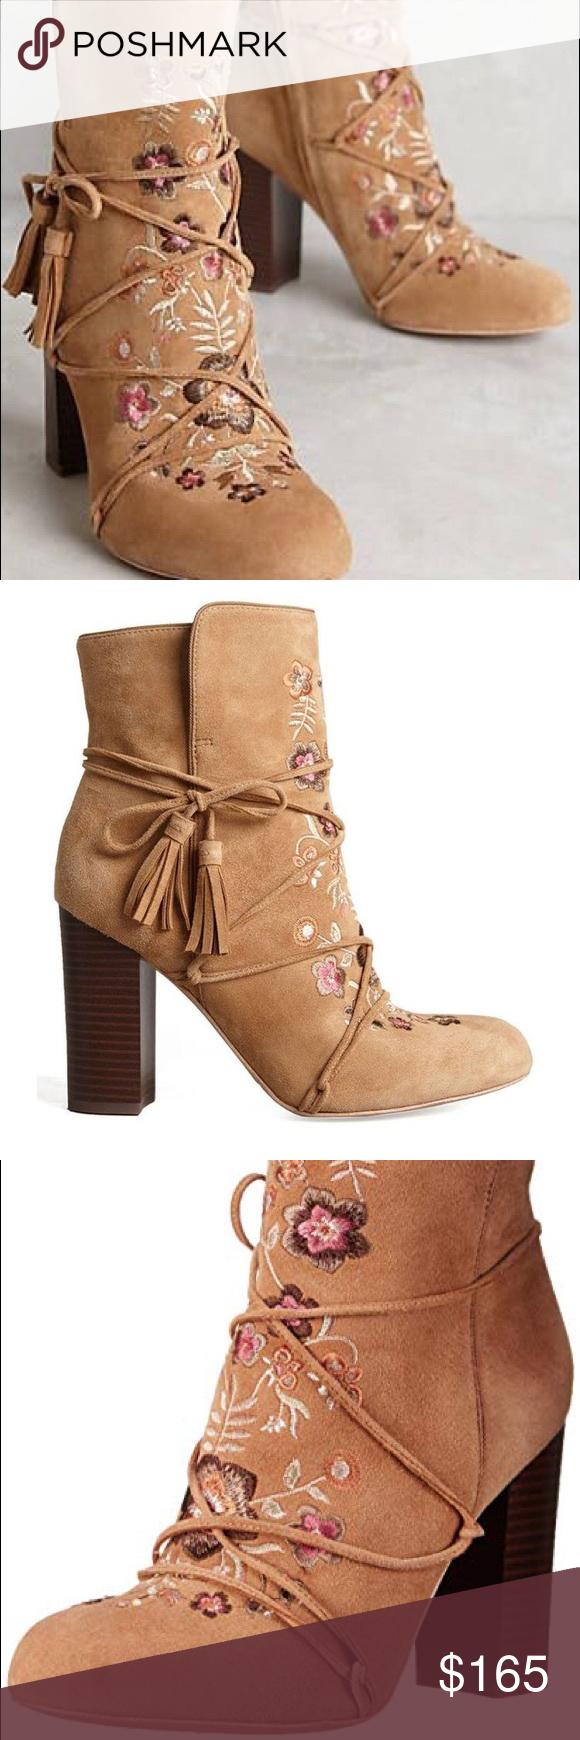 3caba56d6 NWOB Sam Edelman Winnie Floral Ankle Boots Size 8 Brand New Without Box Sam  Edelman Winnie